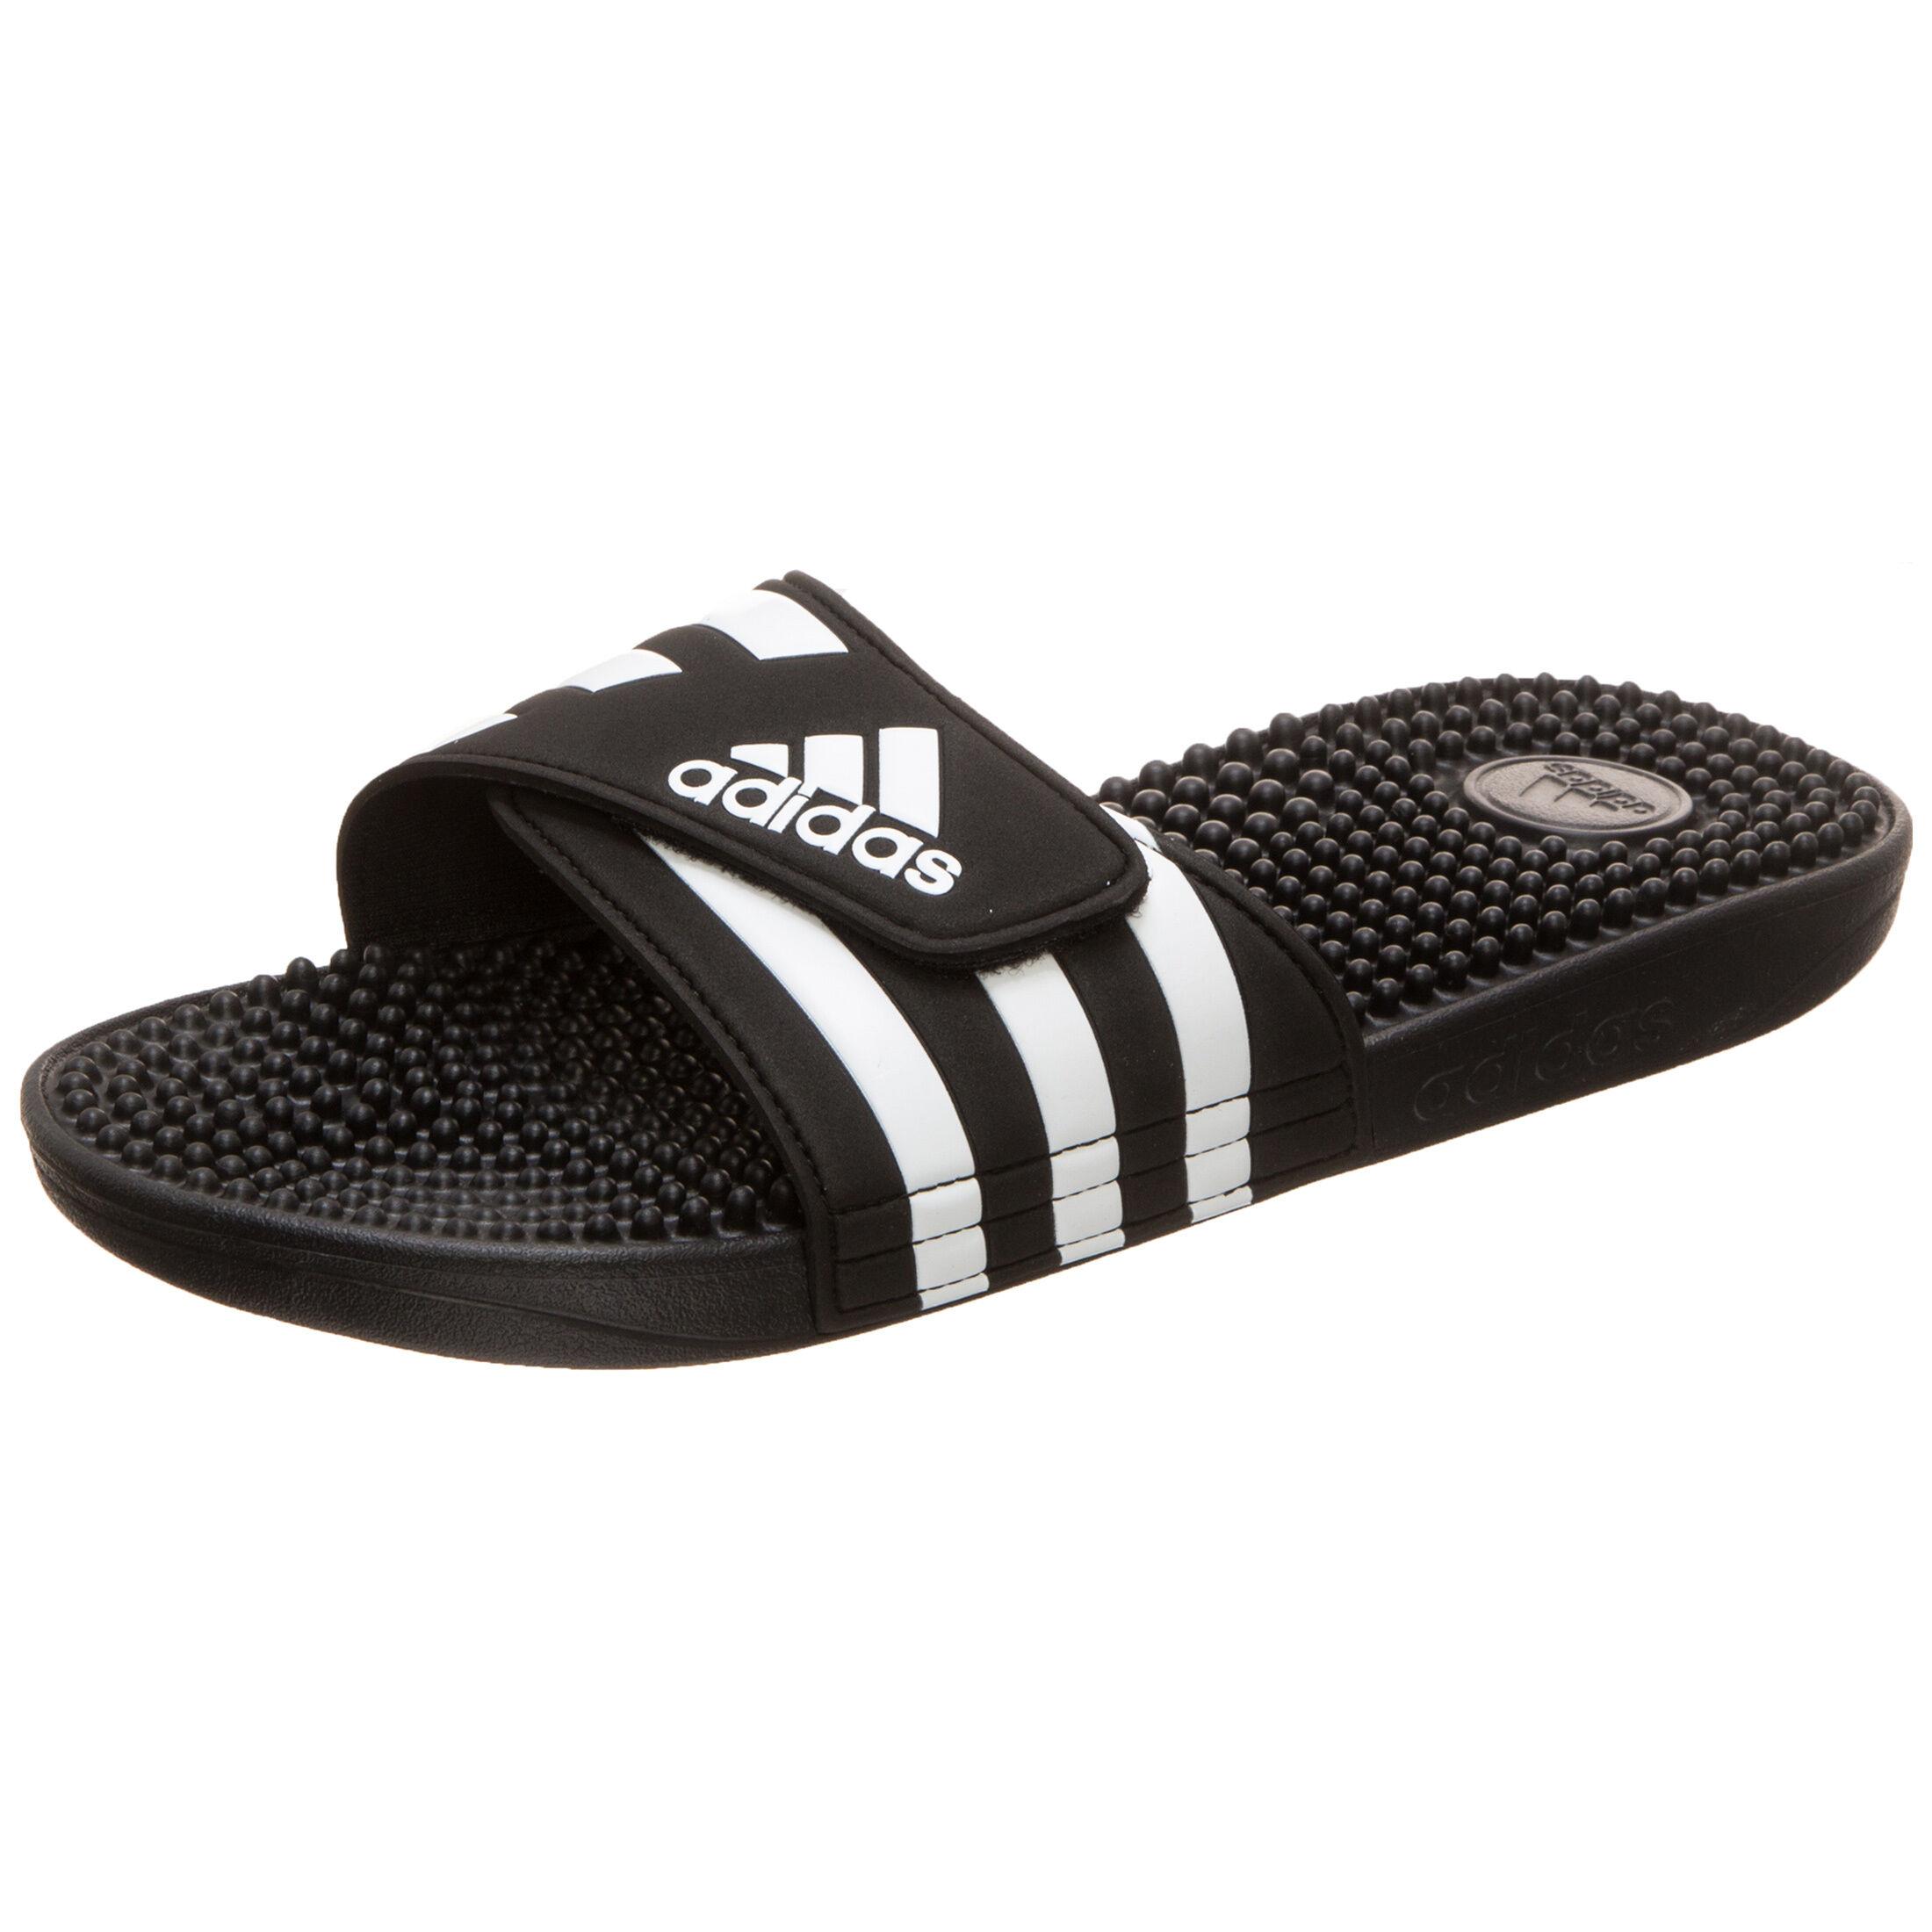 Adidas Originals Adilette Badesandale Herren Online Shops Mint